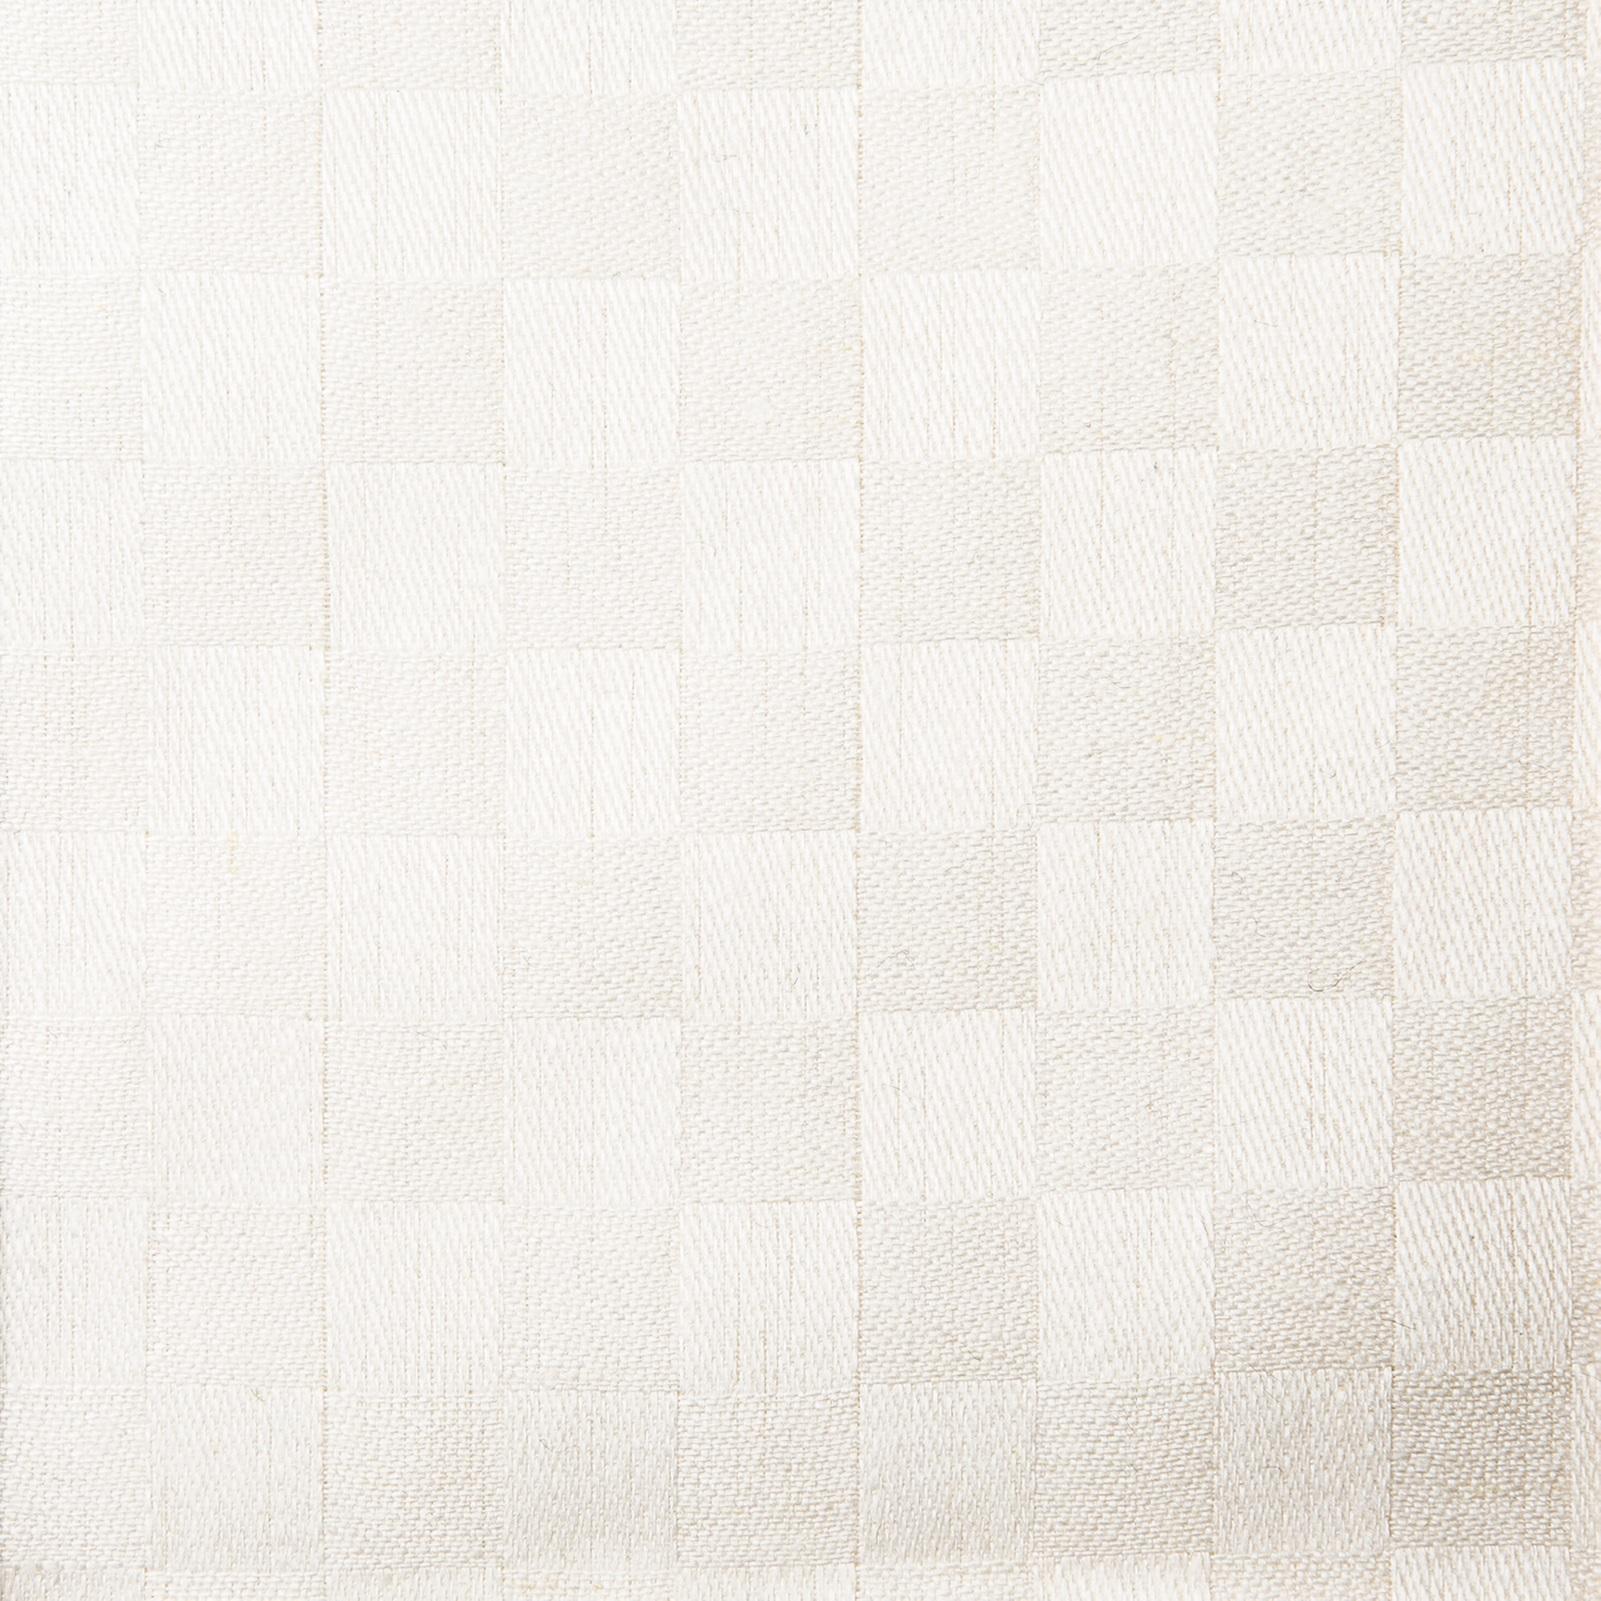 Schackrutan handduk vit